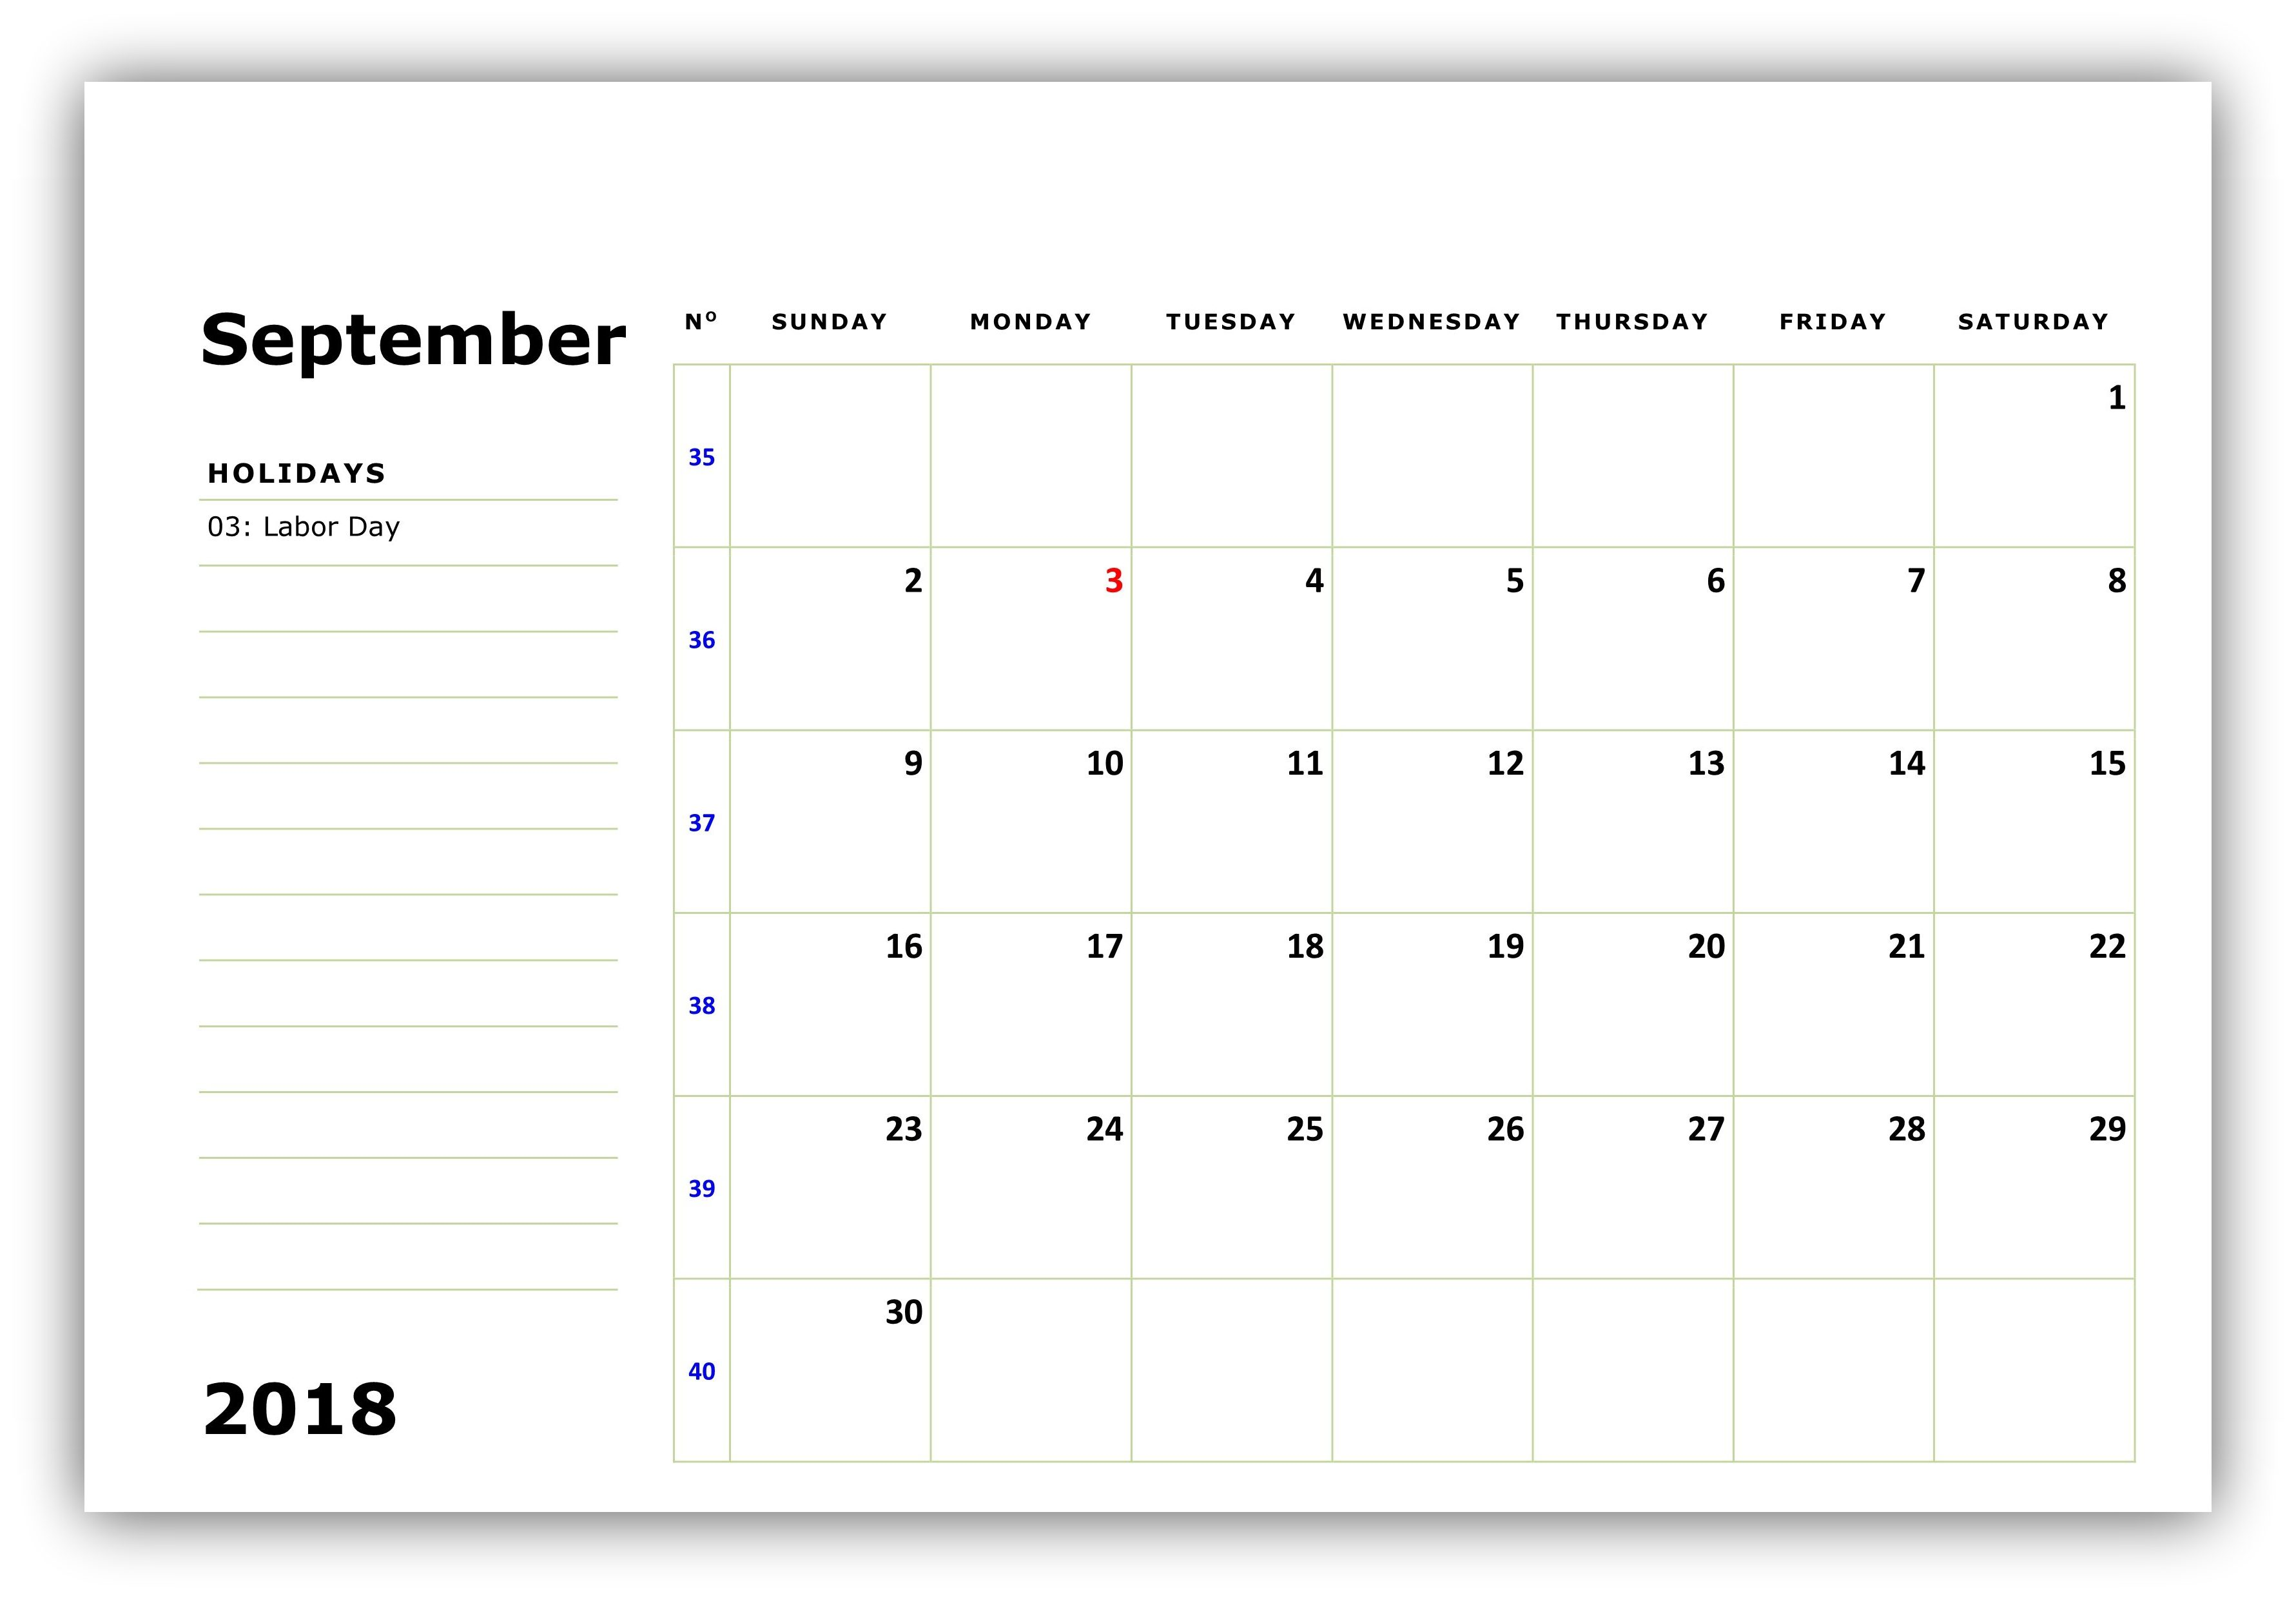 2018 September Calendar to Print